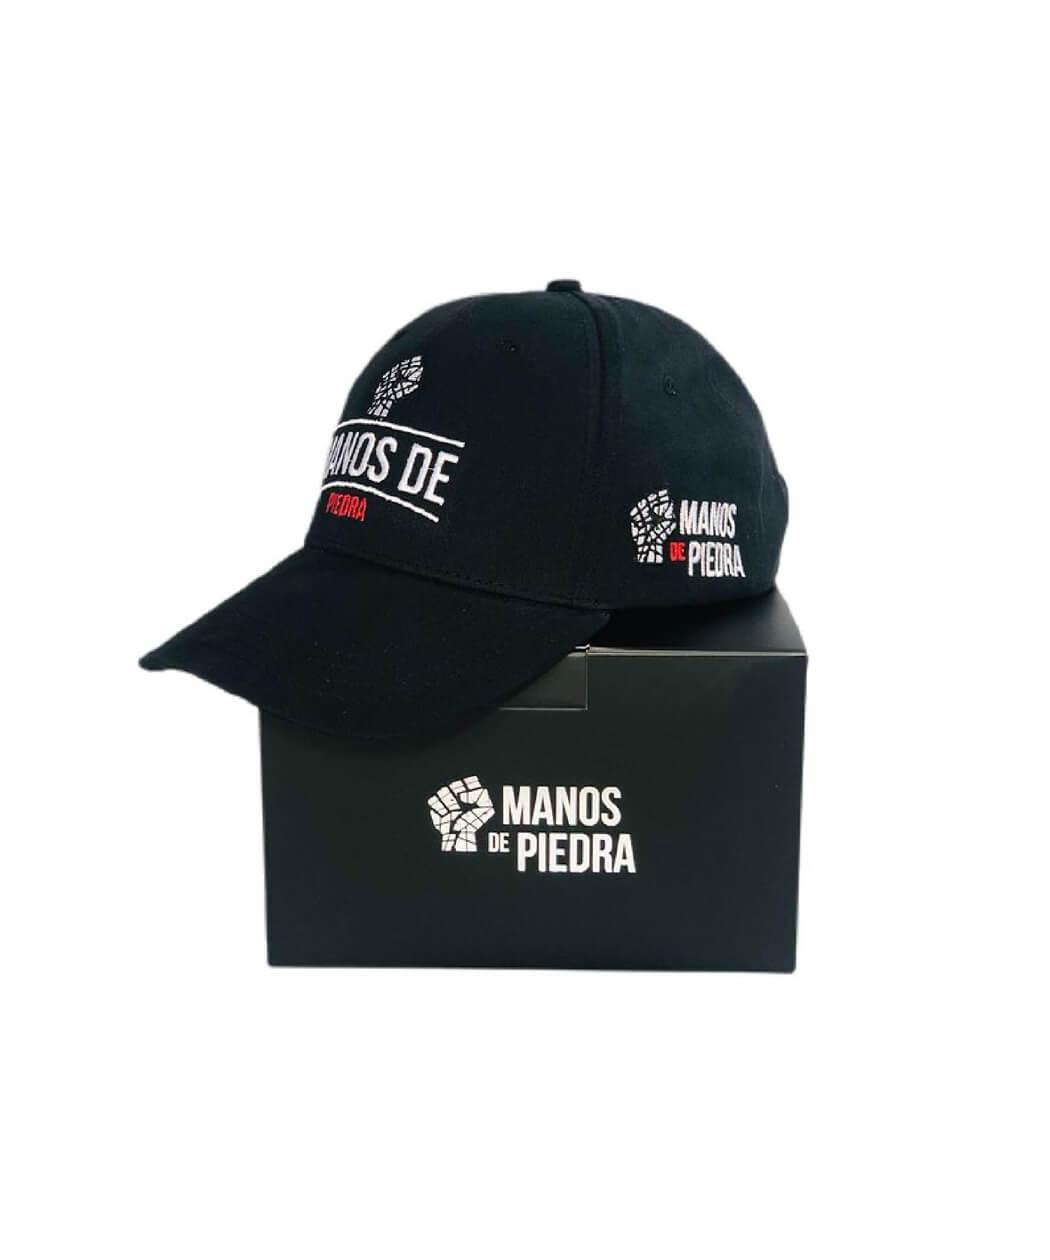 Branded cap design and branded packaging